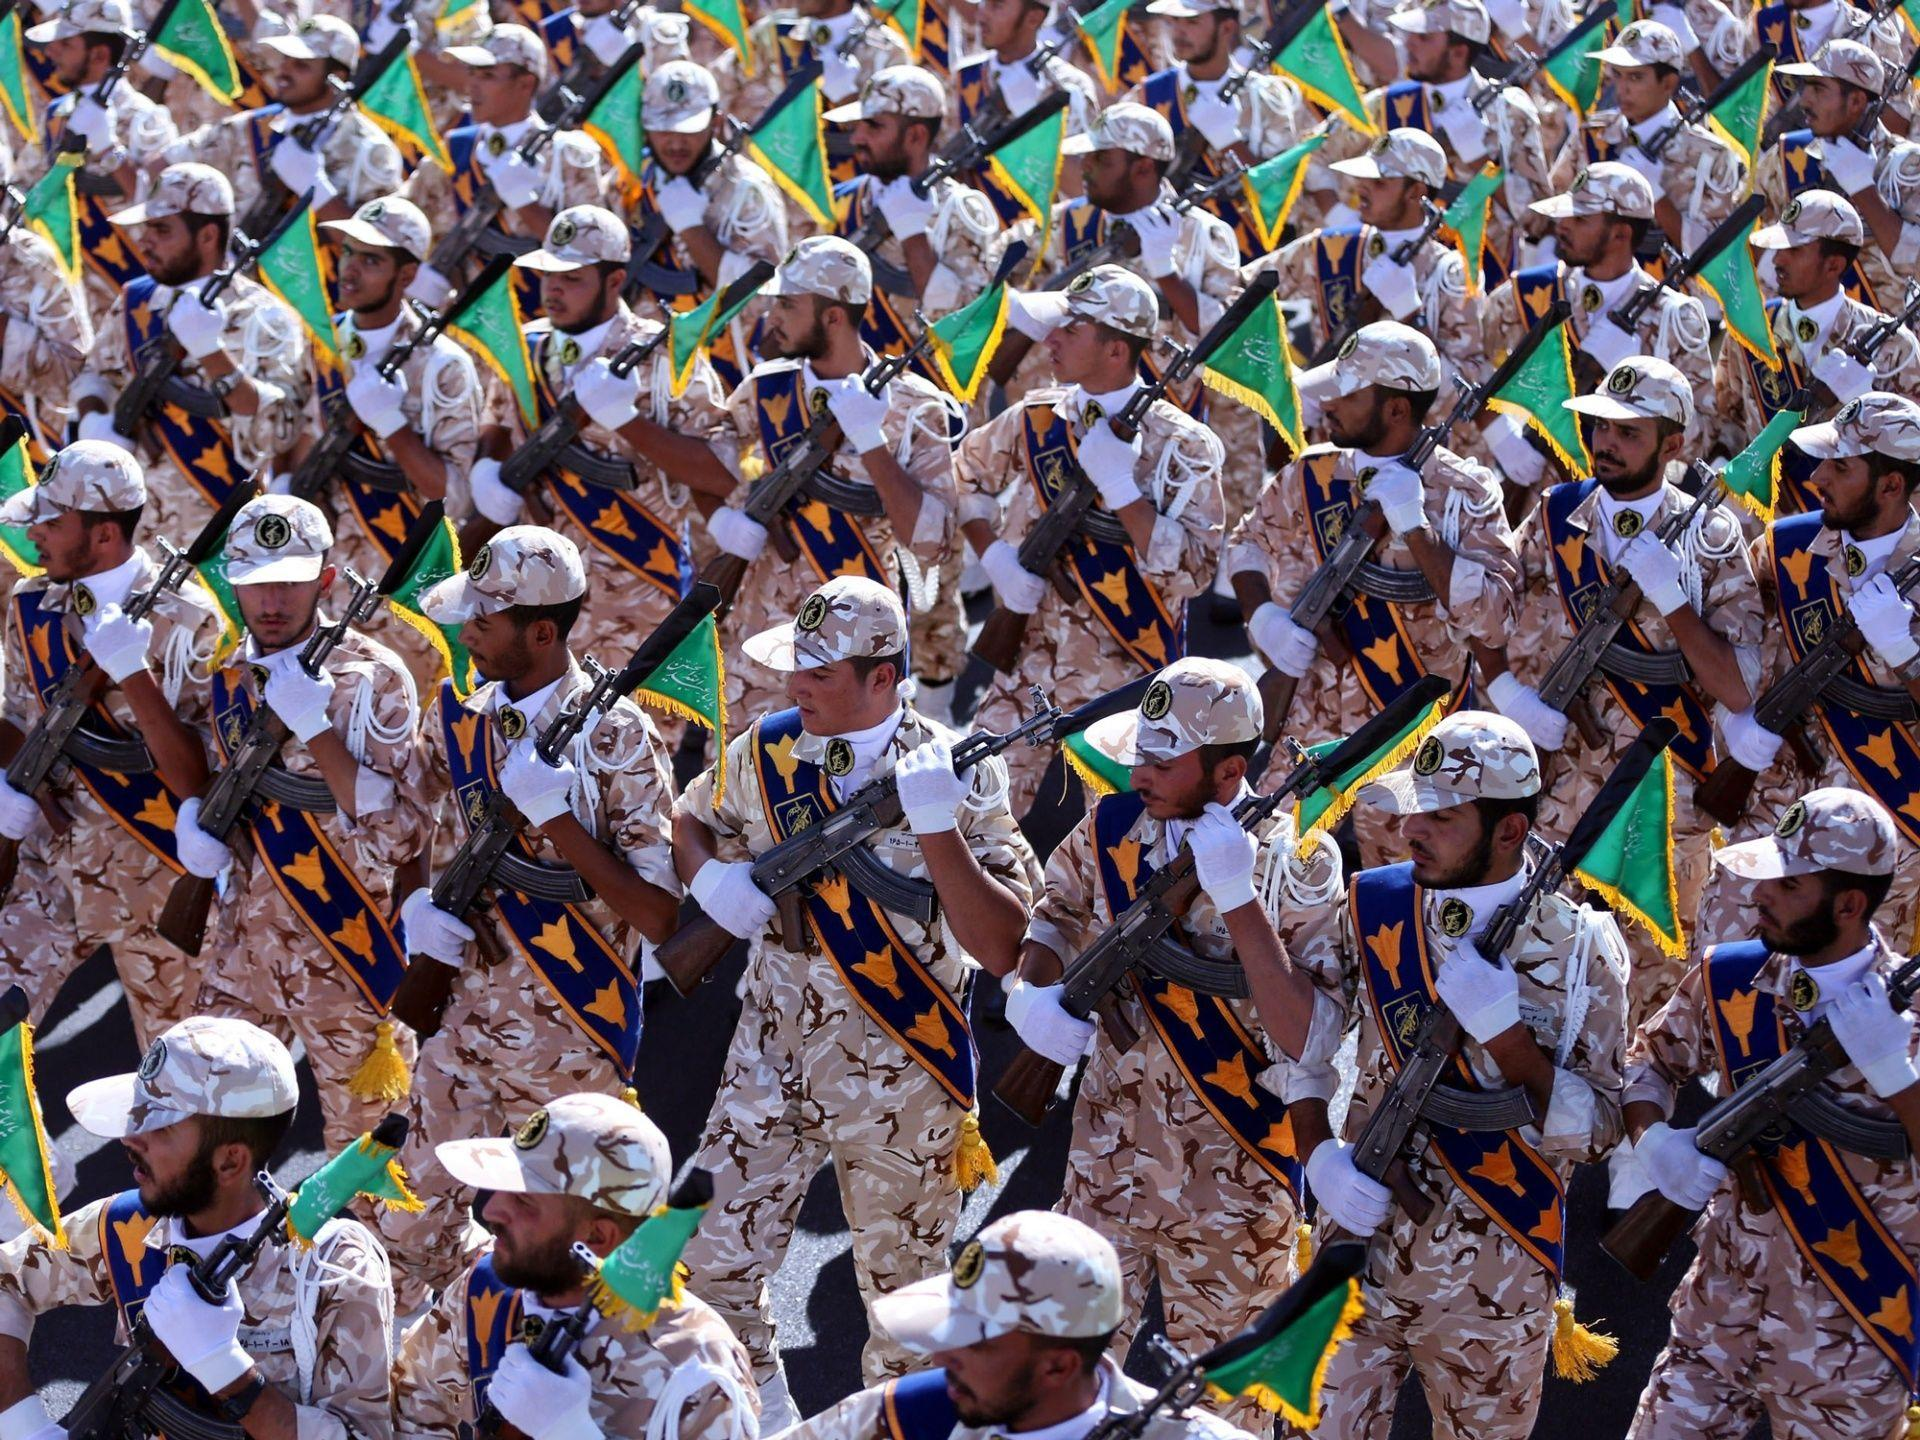 Iran Warns U.S. on Naval Activity in the Gulf